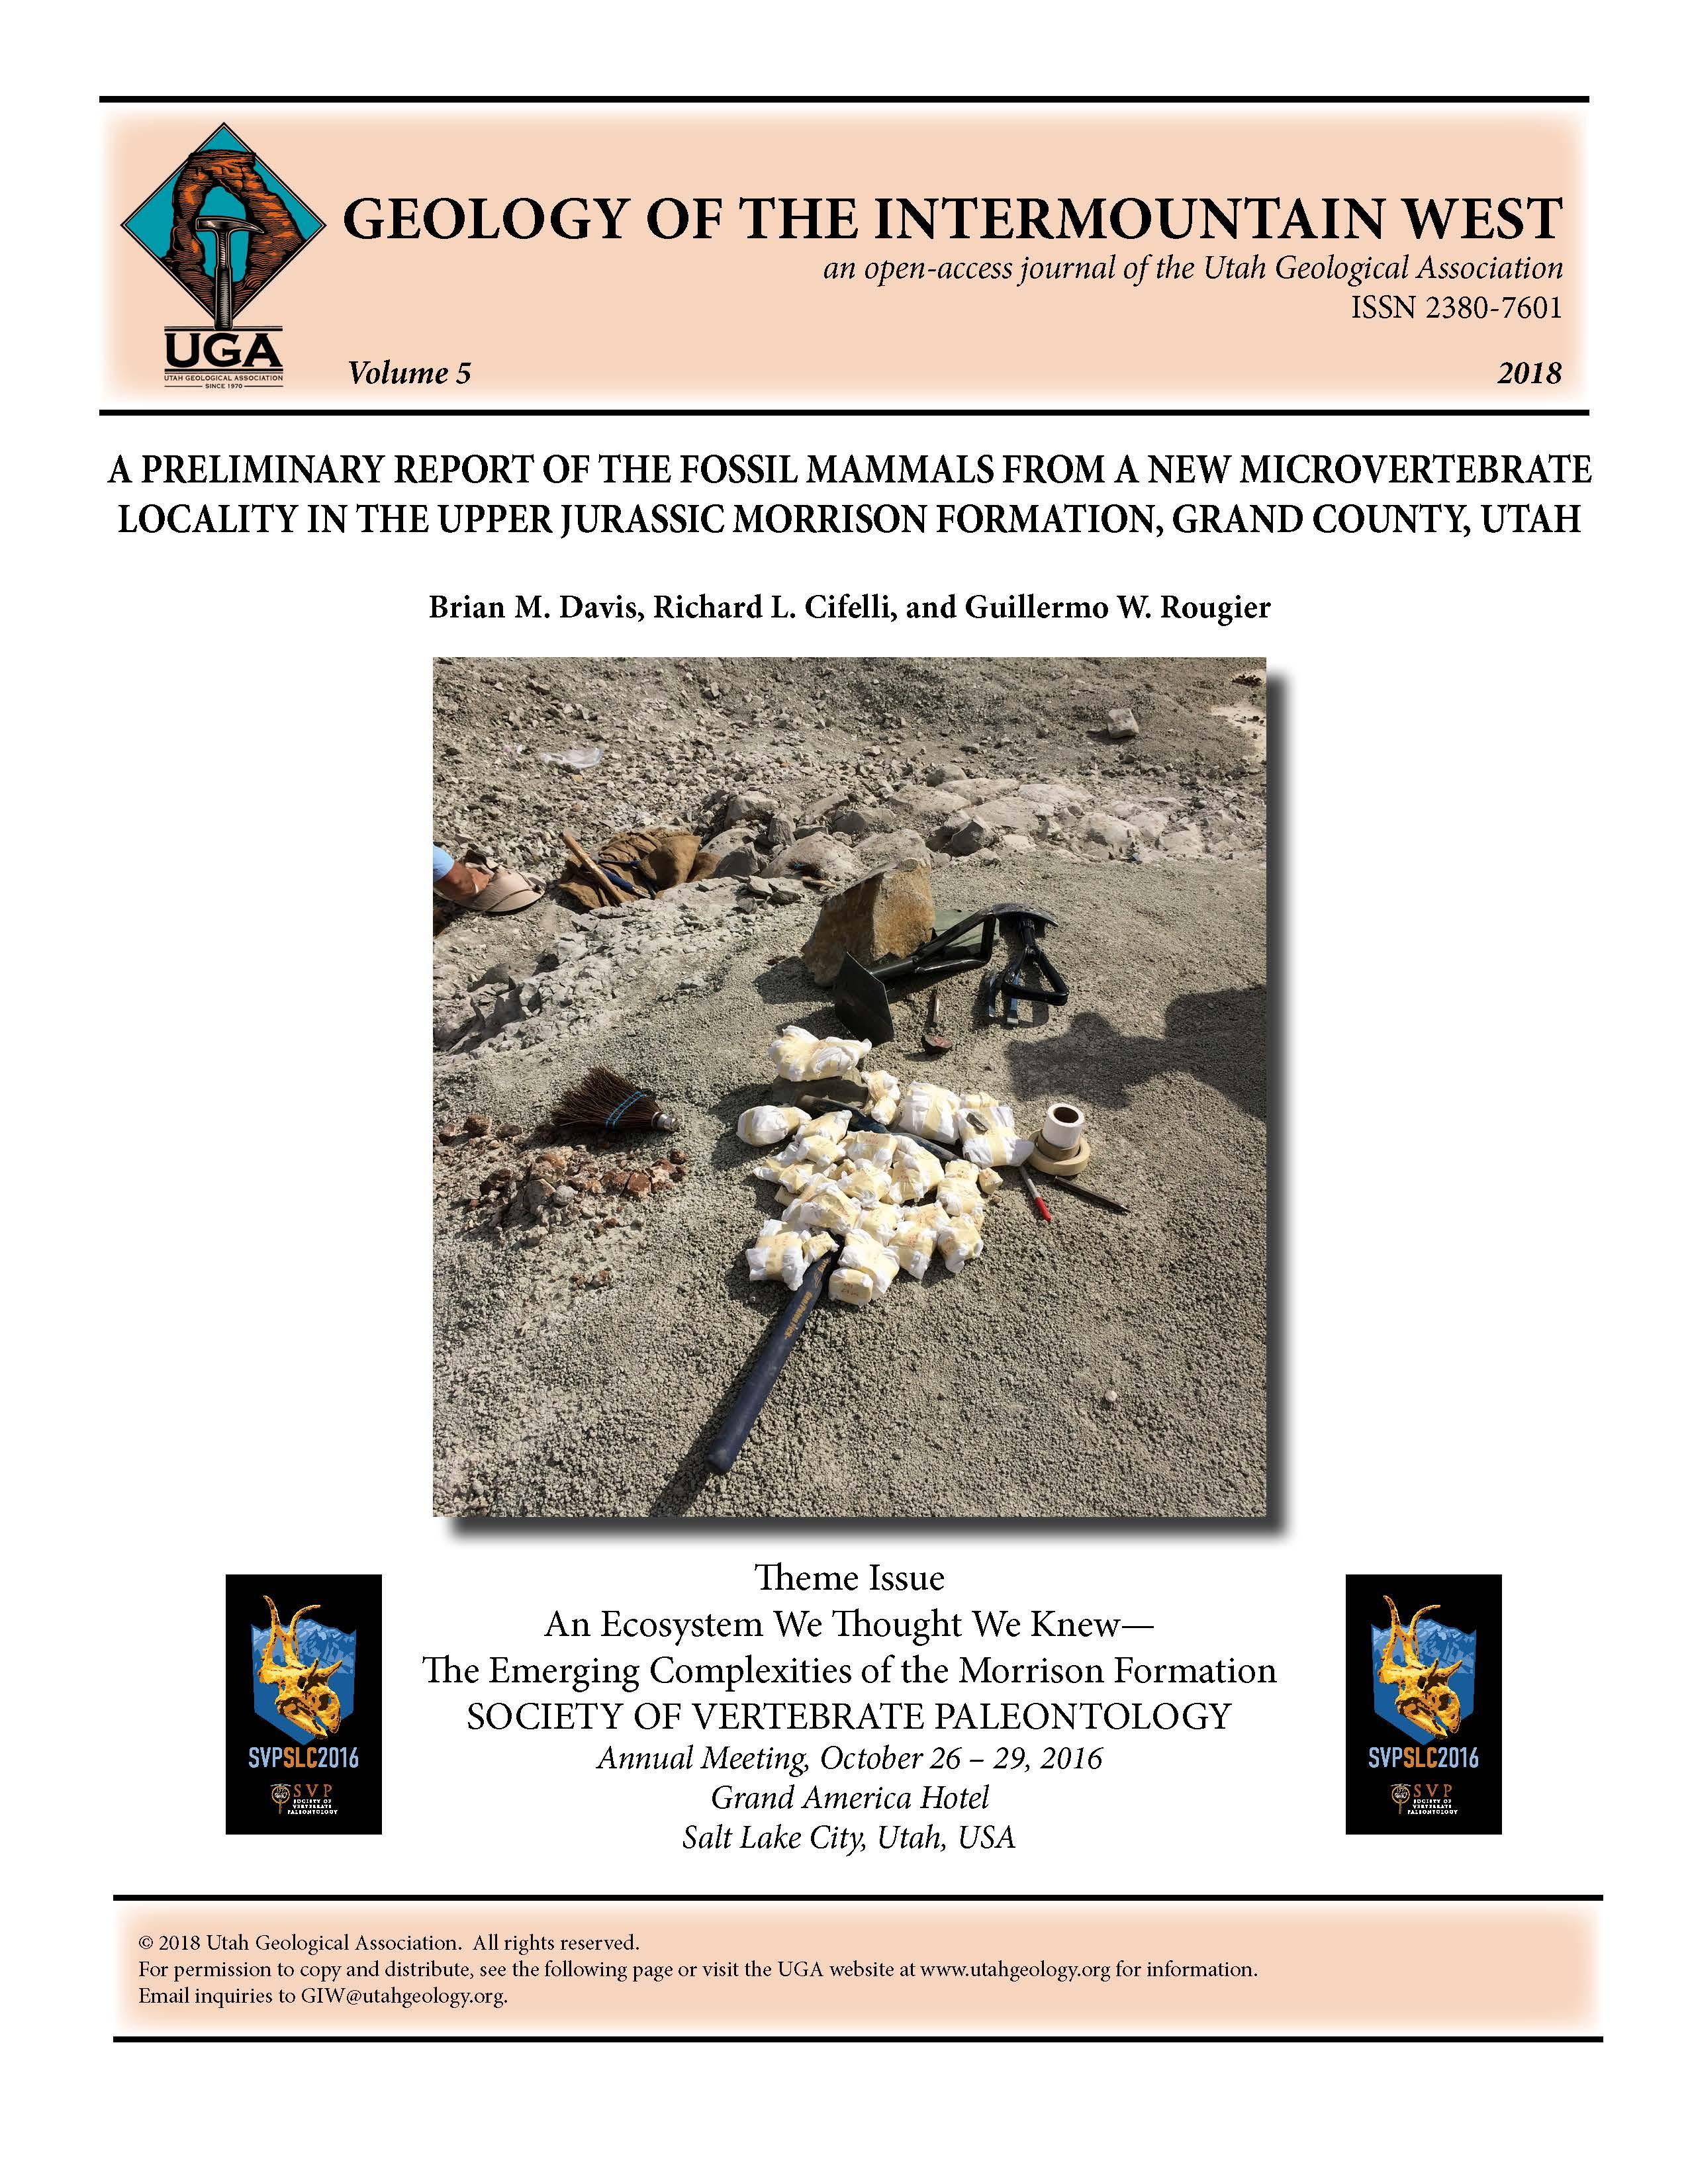 Small vertebrate fossils wrapped for transport, Cisco Mammal Quarry, Upper Jurassic Morrison Formation, Grand County, Utah.